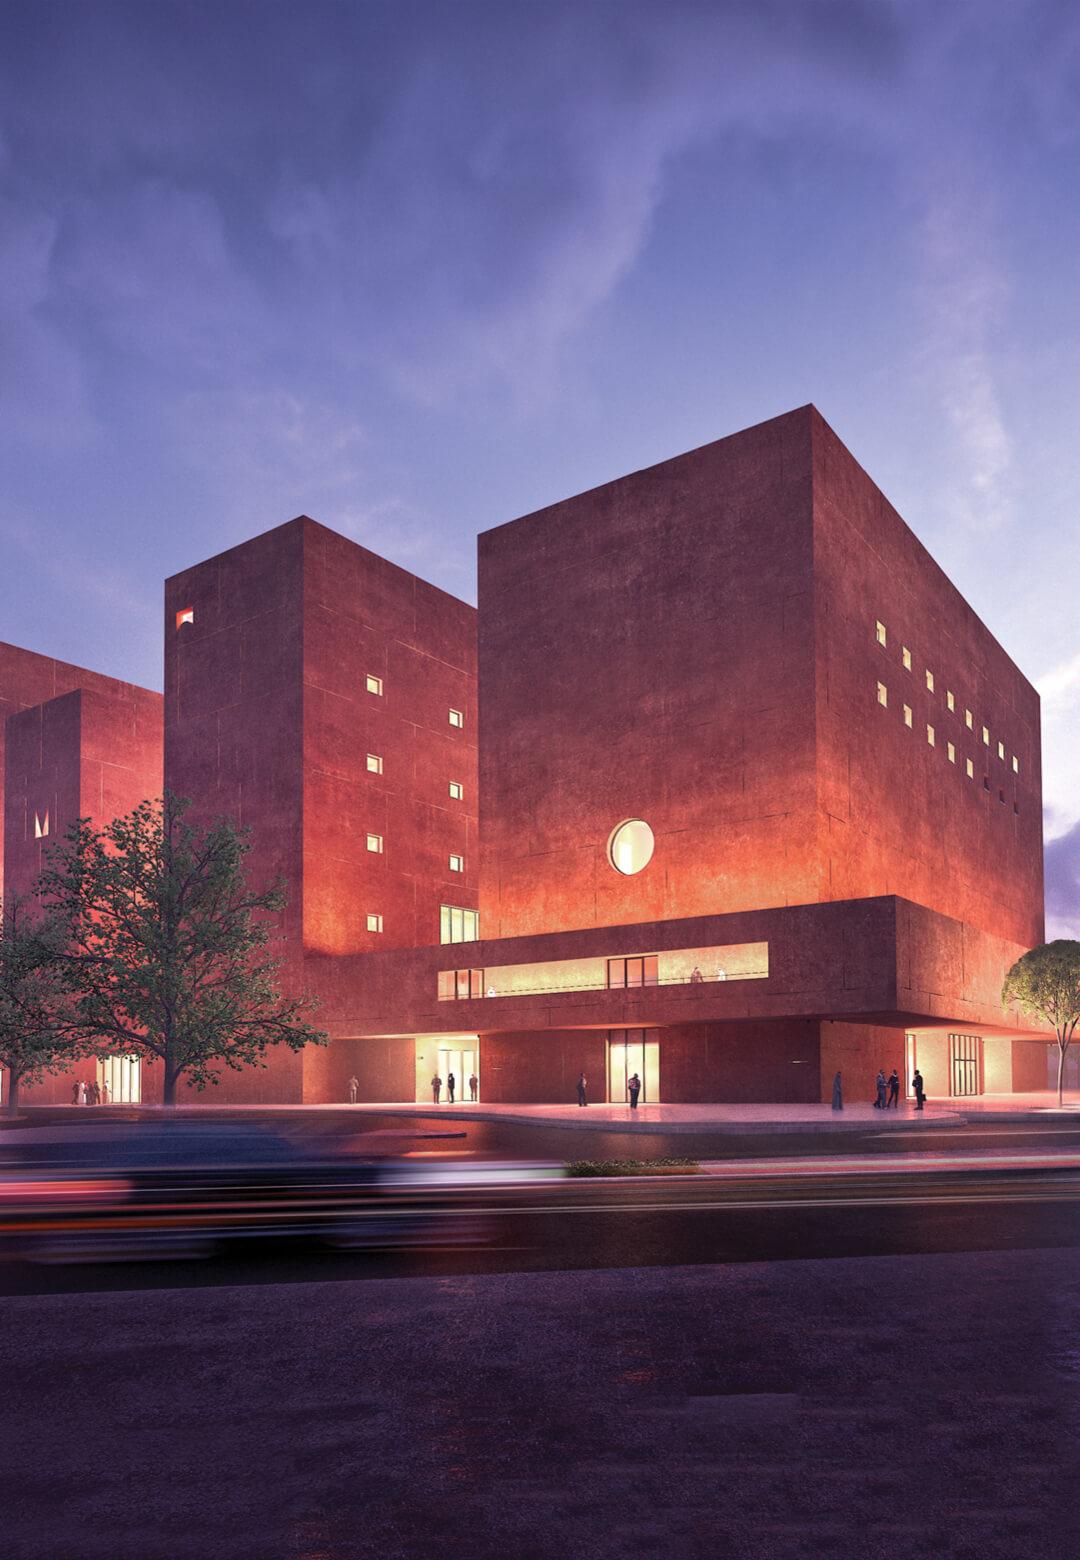 Visualisation of The Africa Institute in Sharjah by Adjaye Associates | The Africa Institute Campus | Adjaye Associates| STIRworld